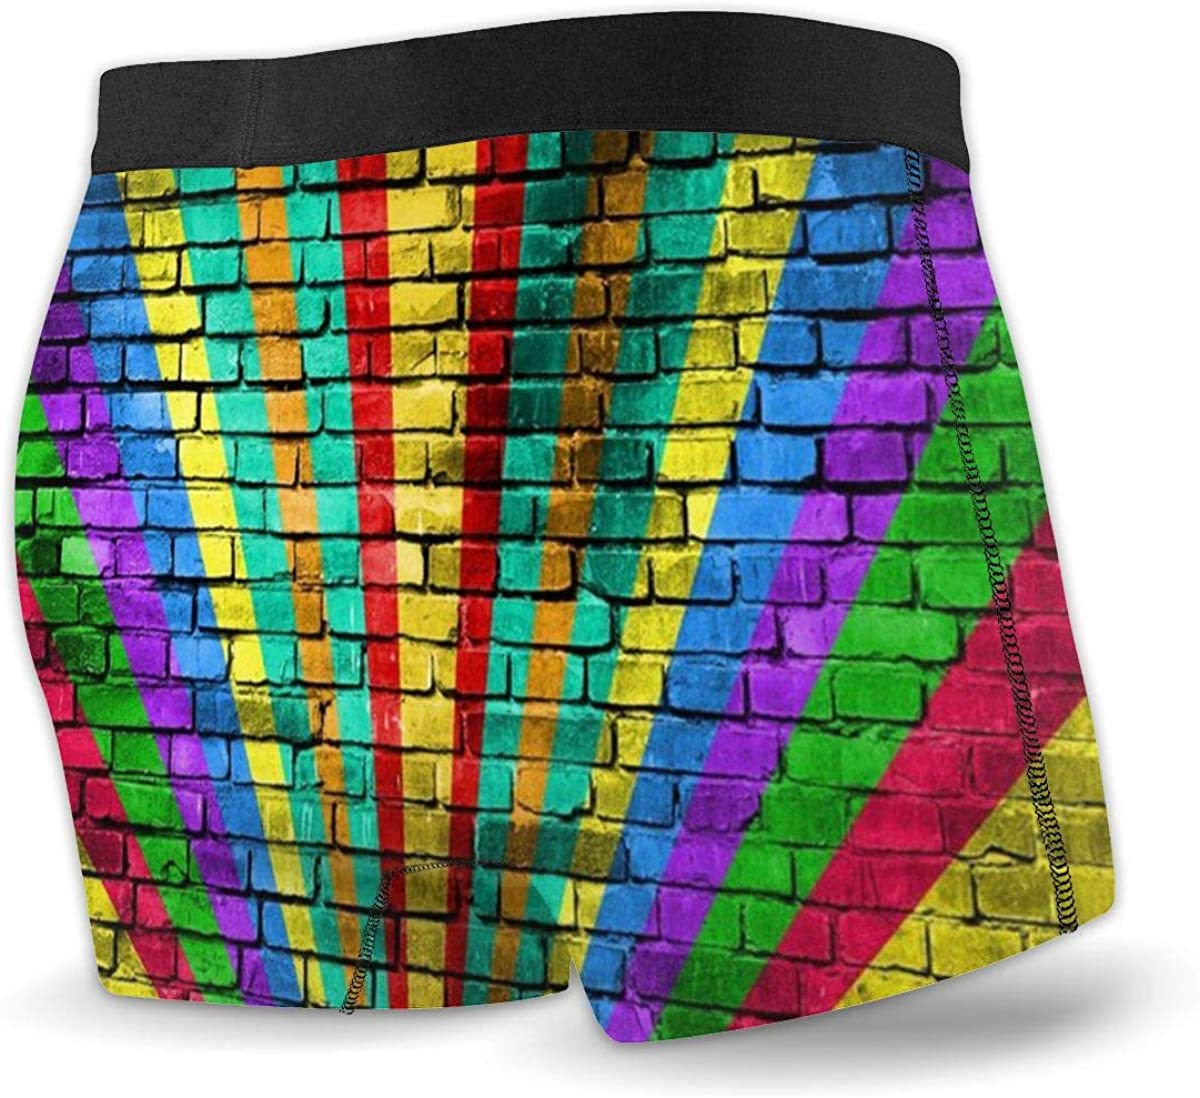 FsszpZZ Boxer Briefs Shorts LGBT Rainbow Flag Painted Old Brick Wall Soft Breathable Comfortable Underwear for Men